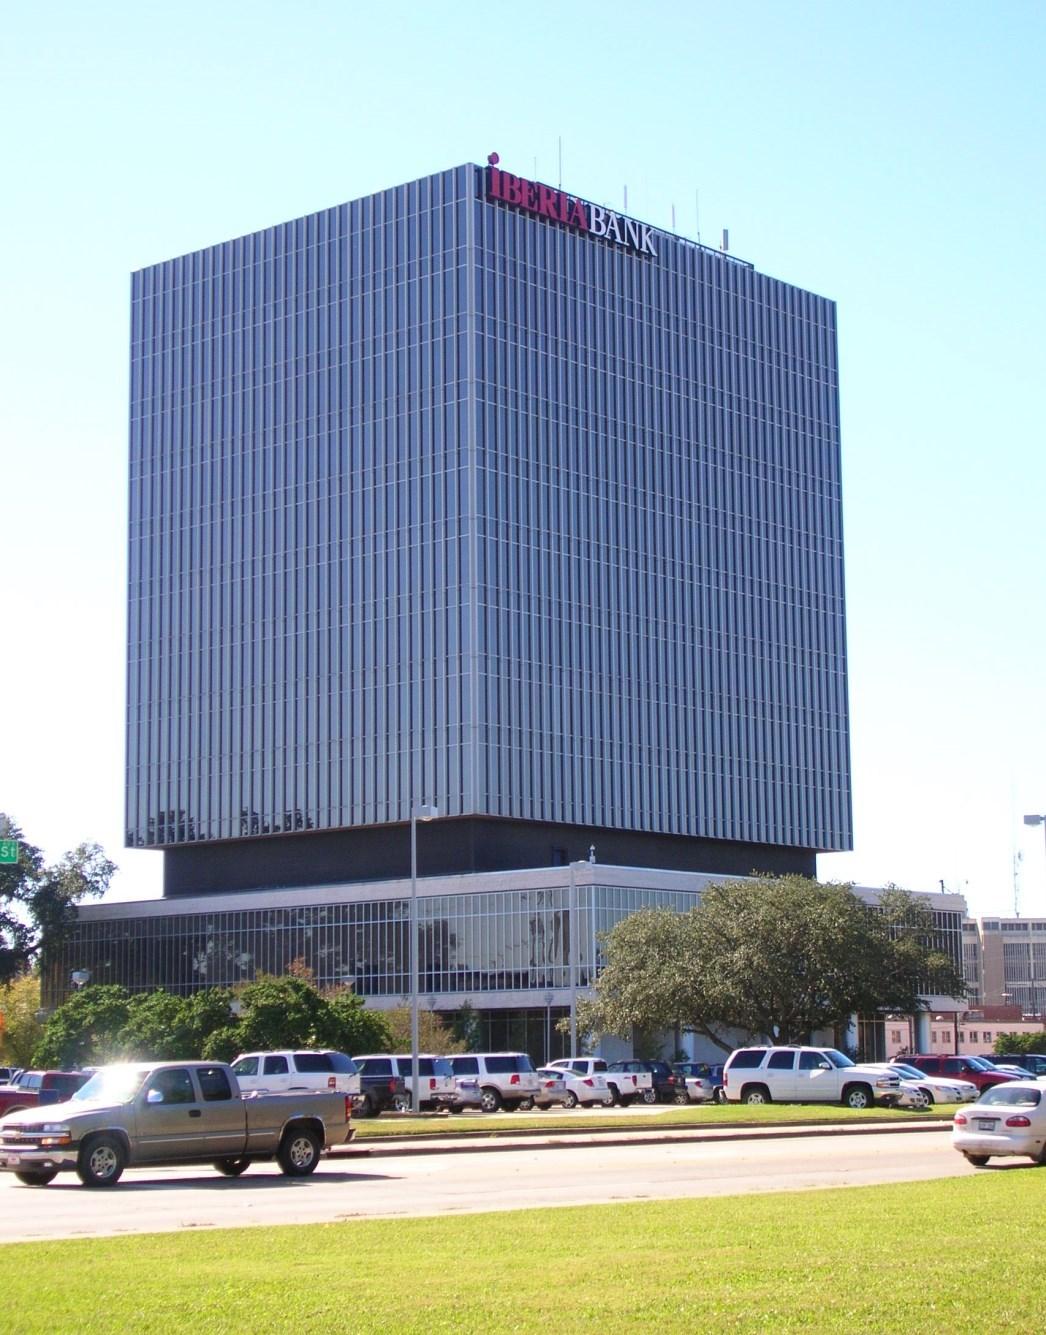 IBERIABANK Corporate office